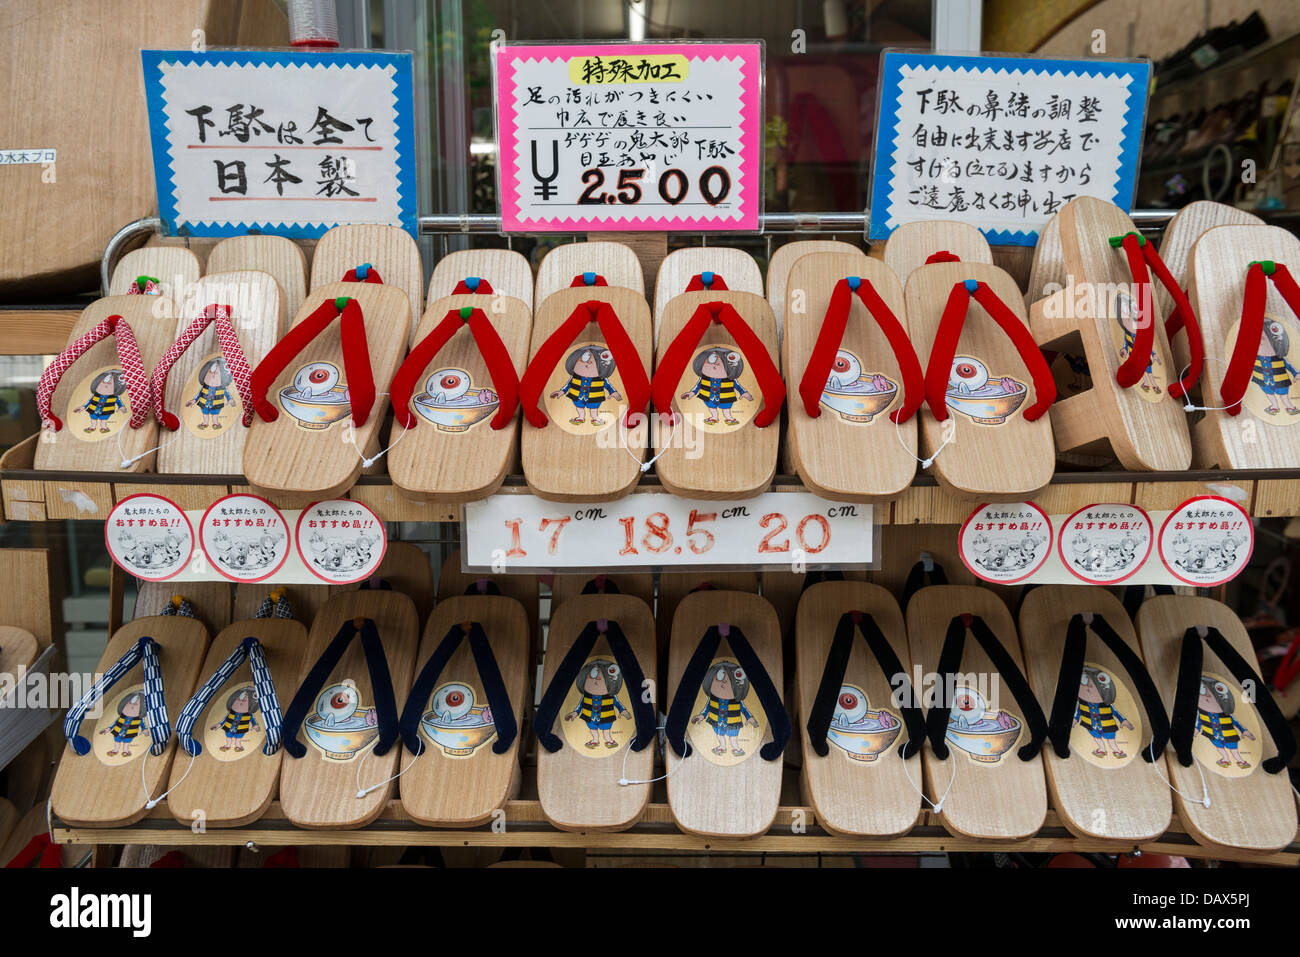 Manga Anime series GeGeGe no Kitaro themed Souvenir Sandal, Sakaiminato Japan - Stock Image